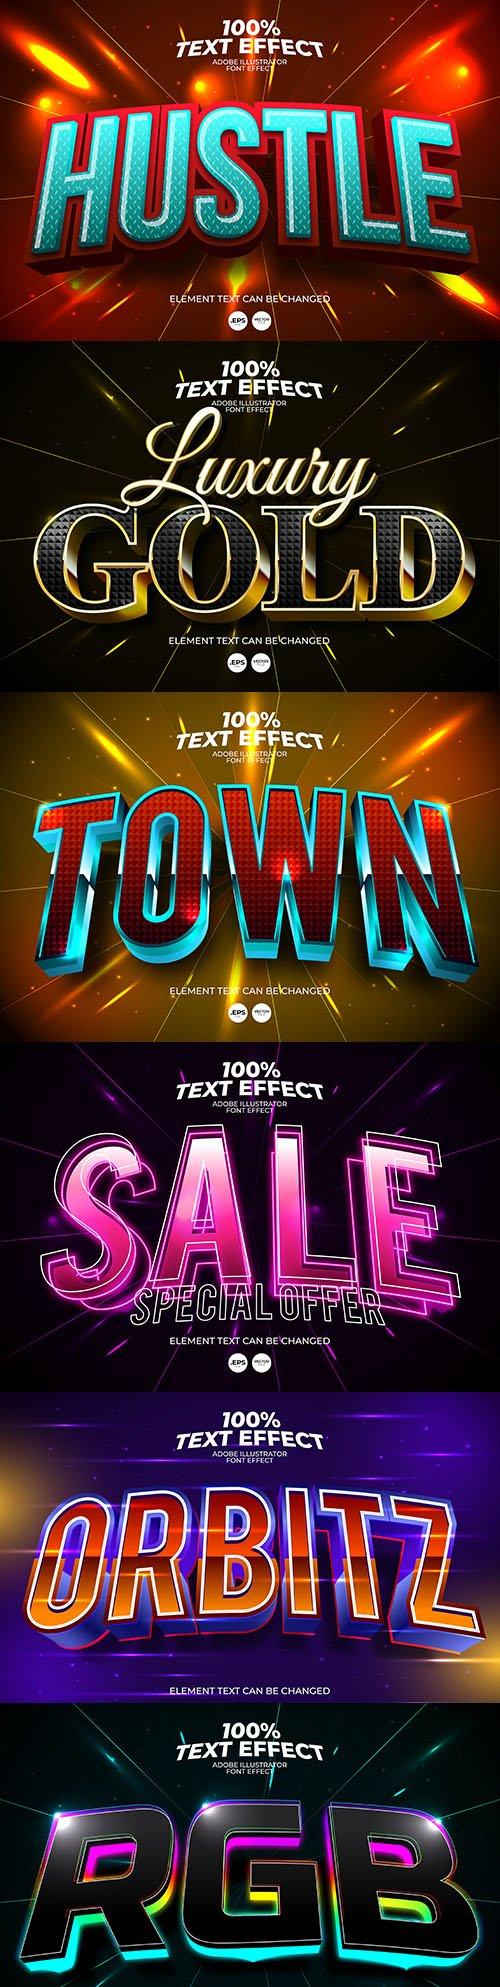 Editable font effect text collection illustration design 192